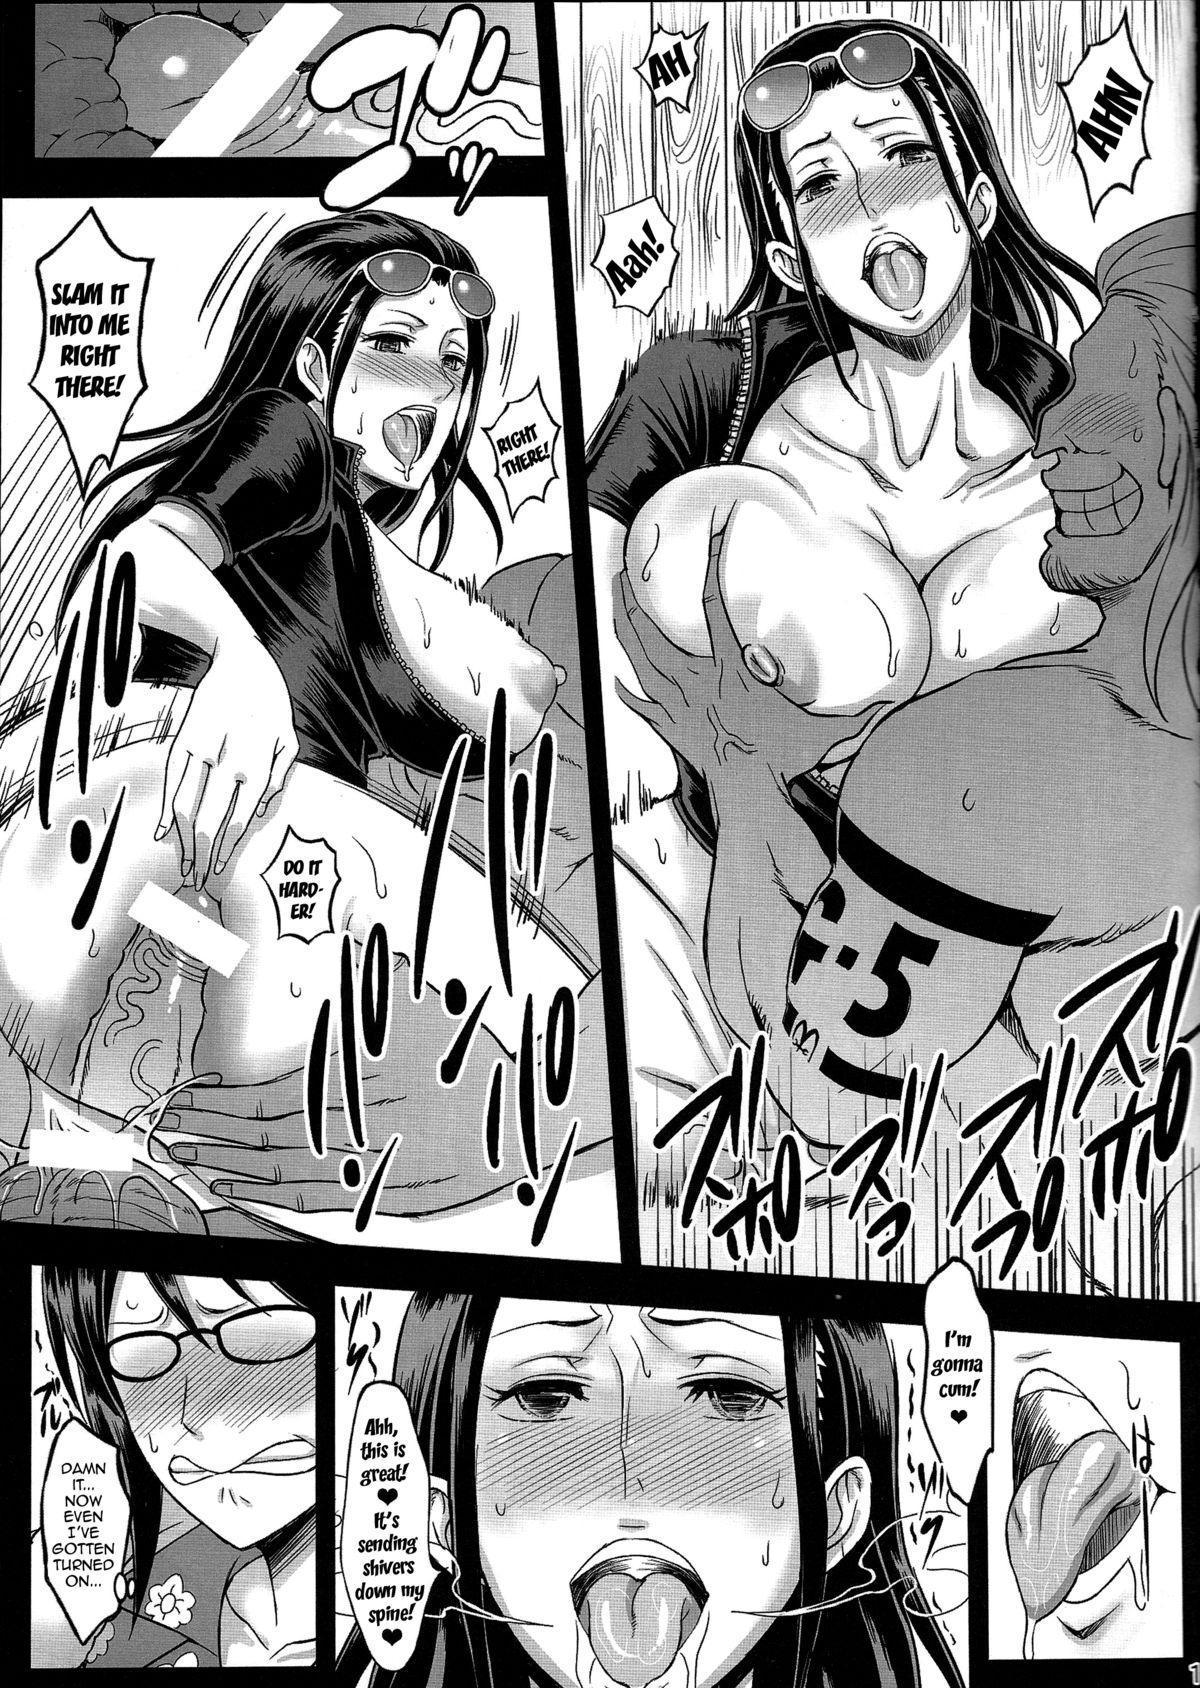 Rakuen Onna Kaizoku 3 - Woman Pirate in Paradise 17